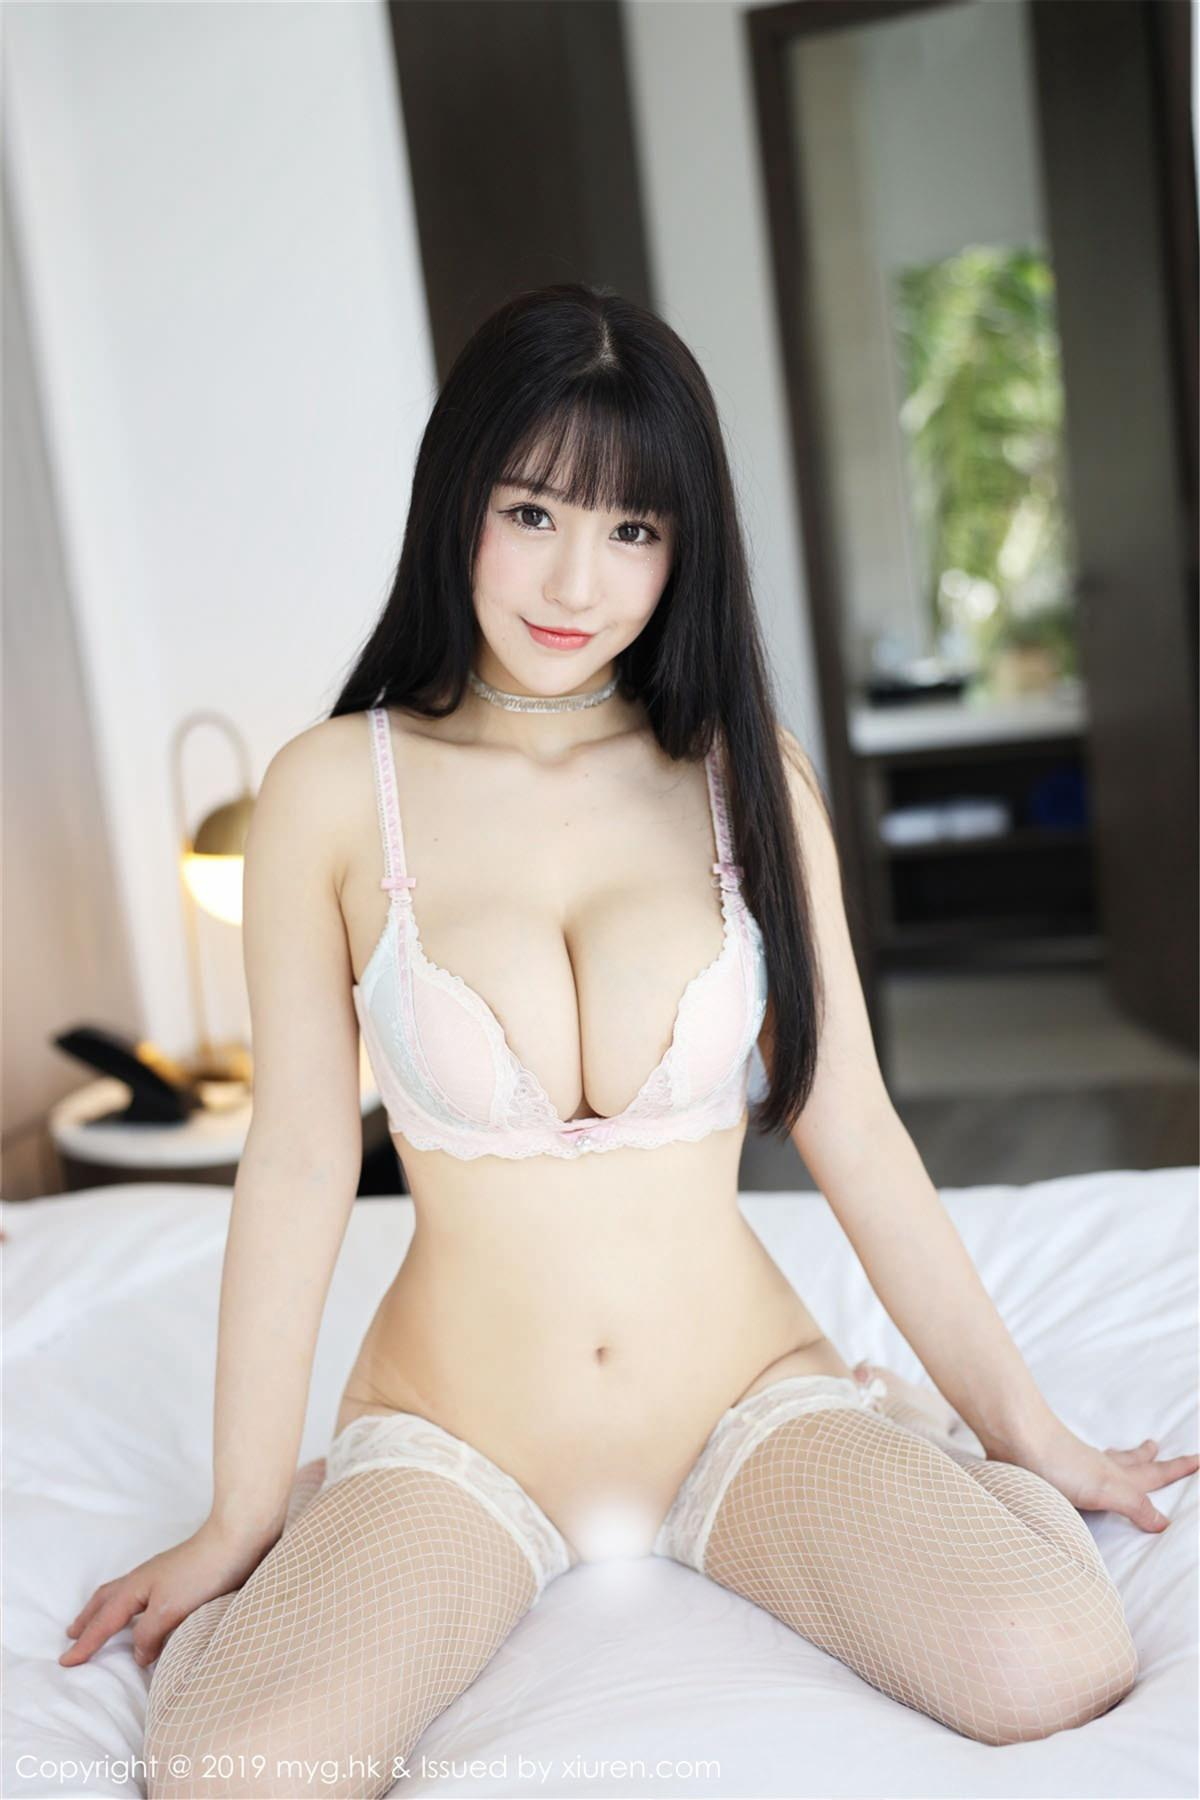 MyGirl Vol.364 27P, mygirl, Zhu Ke Er